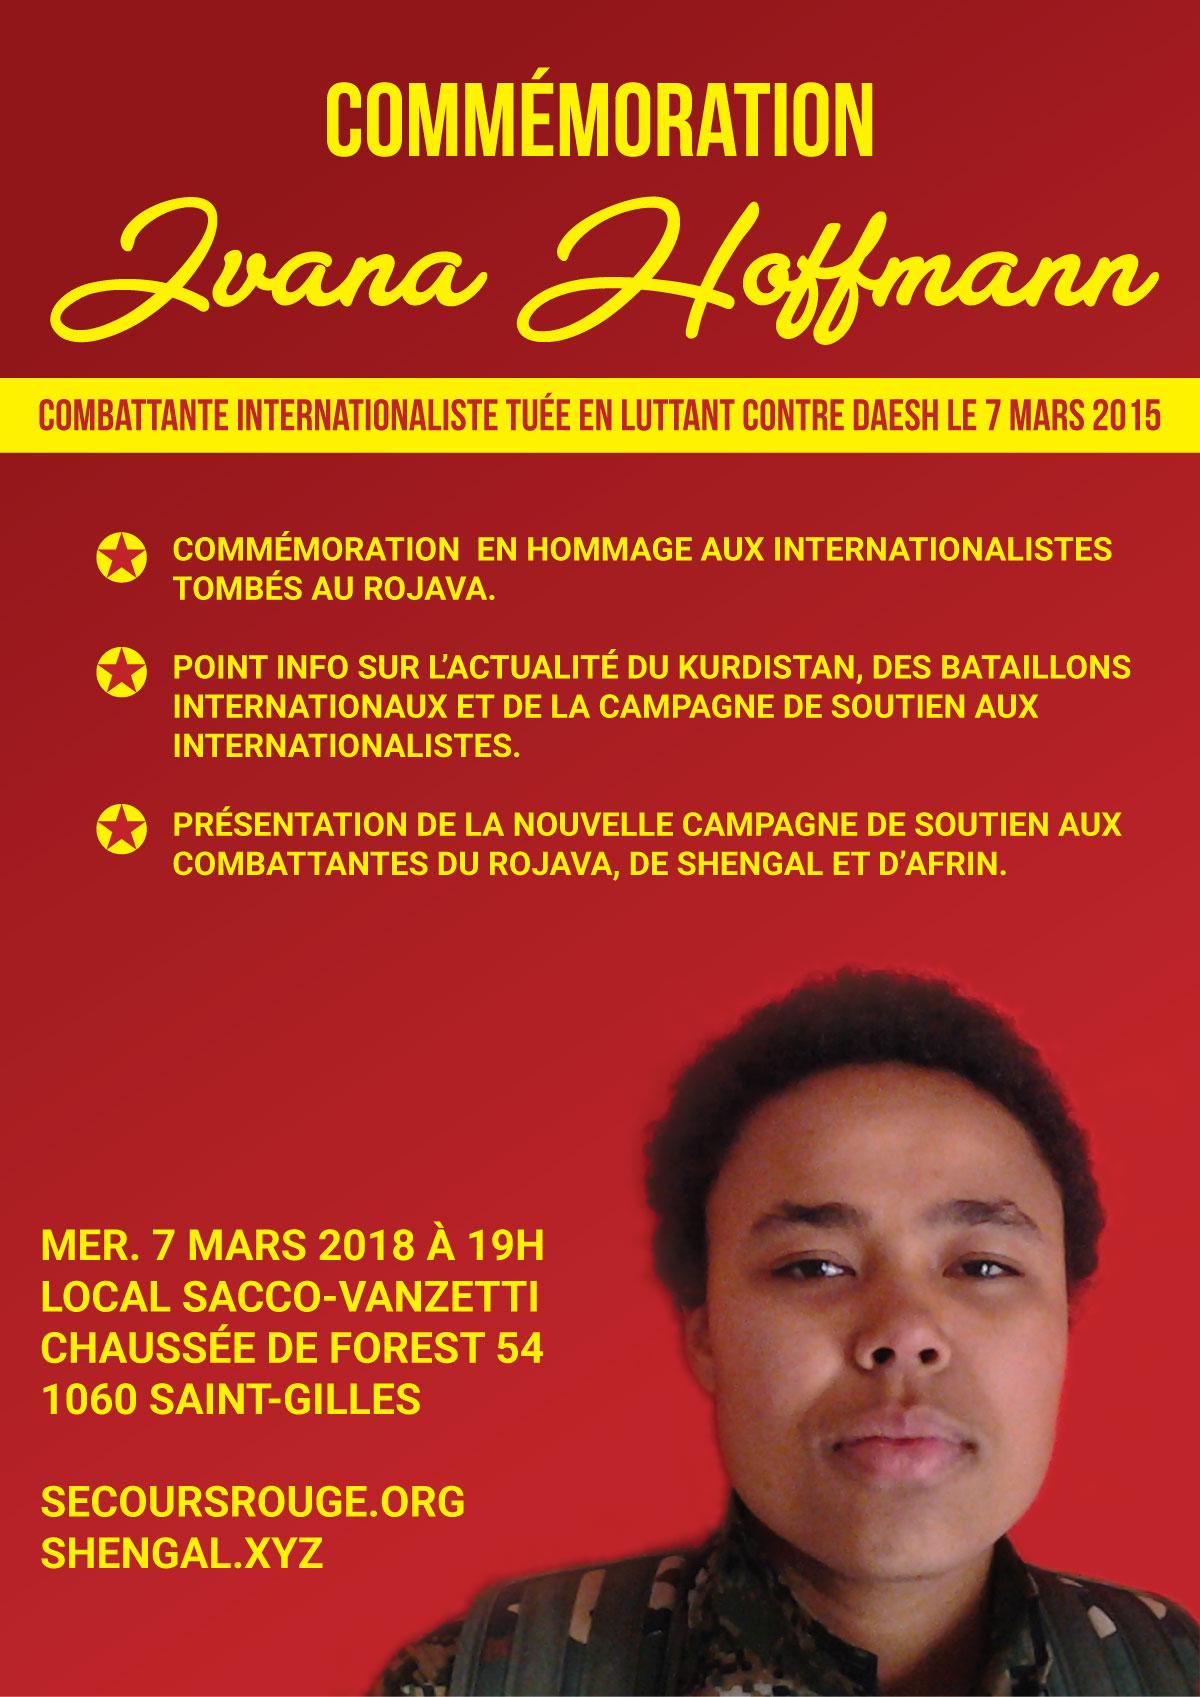 Commémoration Ivana Hoffmann